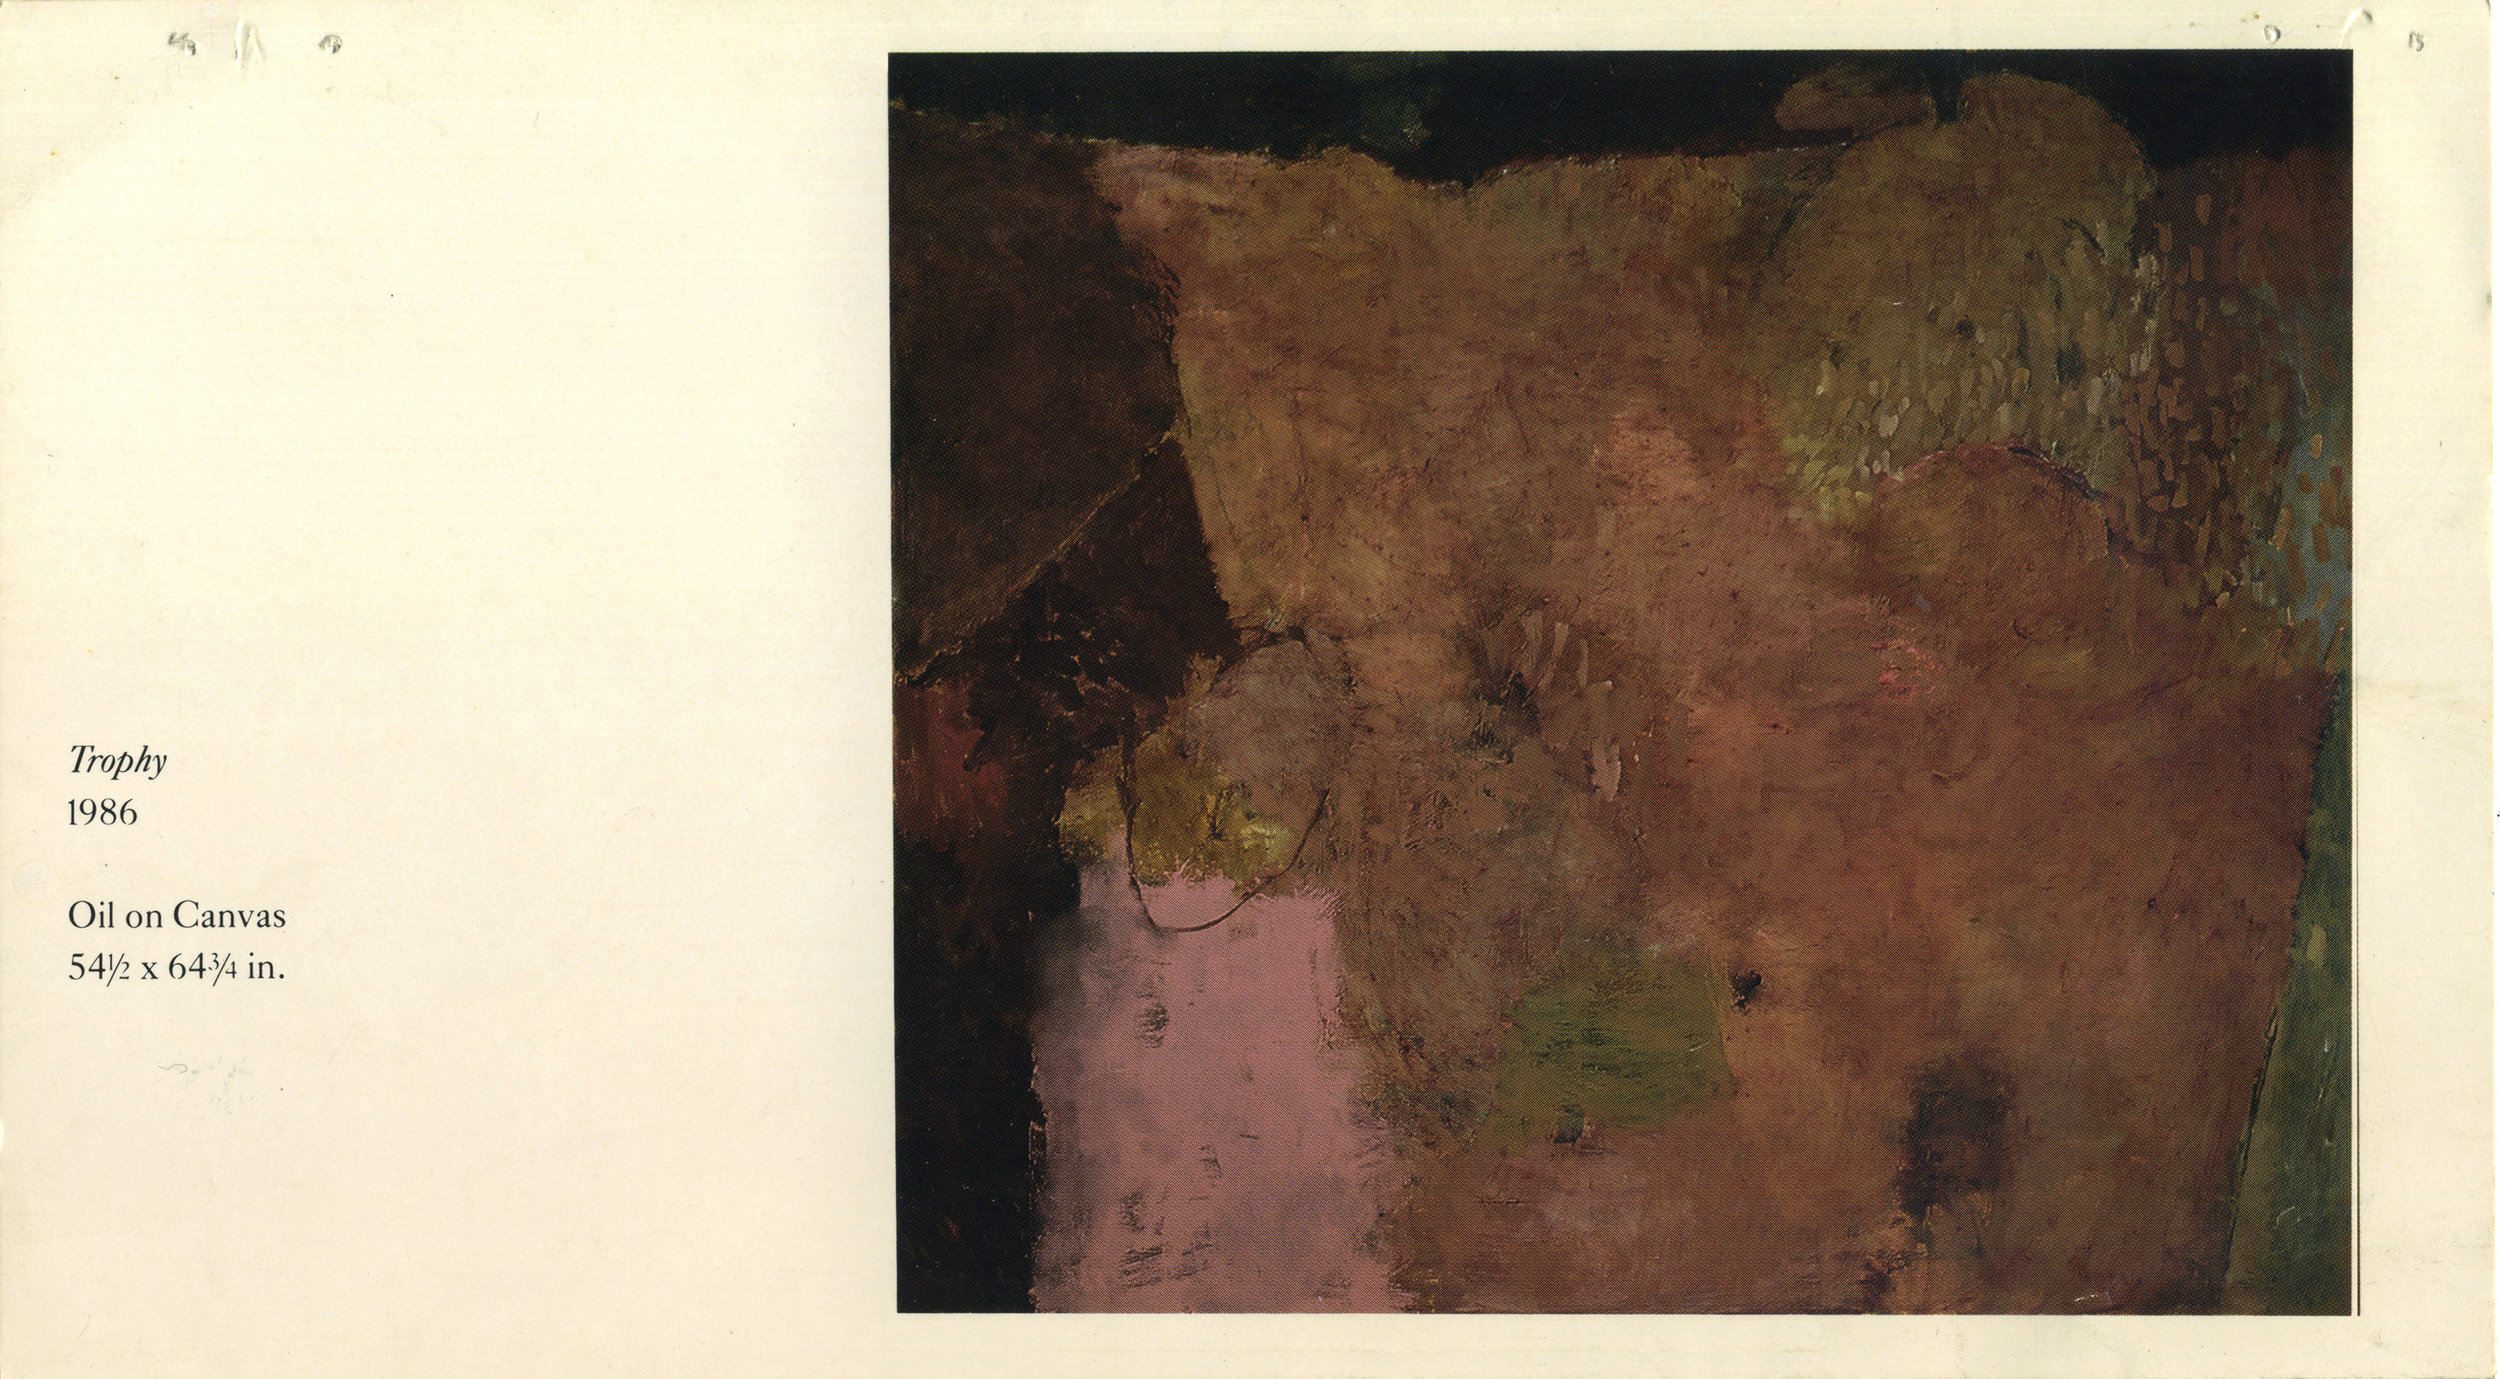 1986, Mira Godard Gallery, Toronto